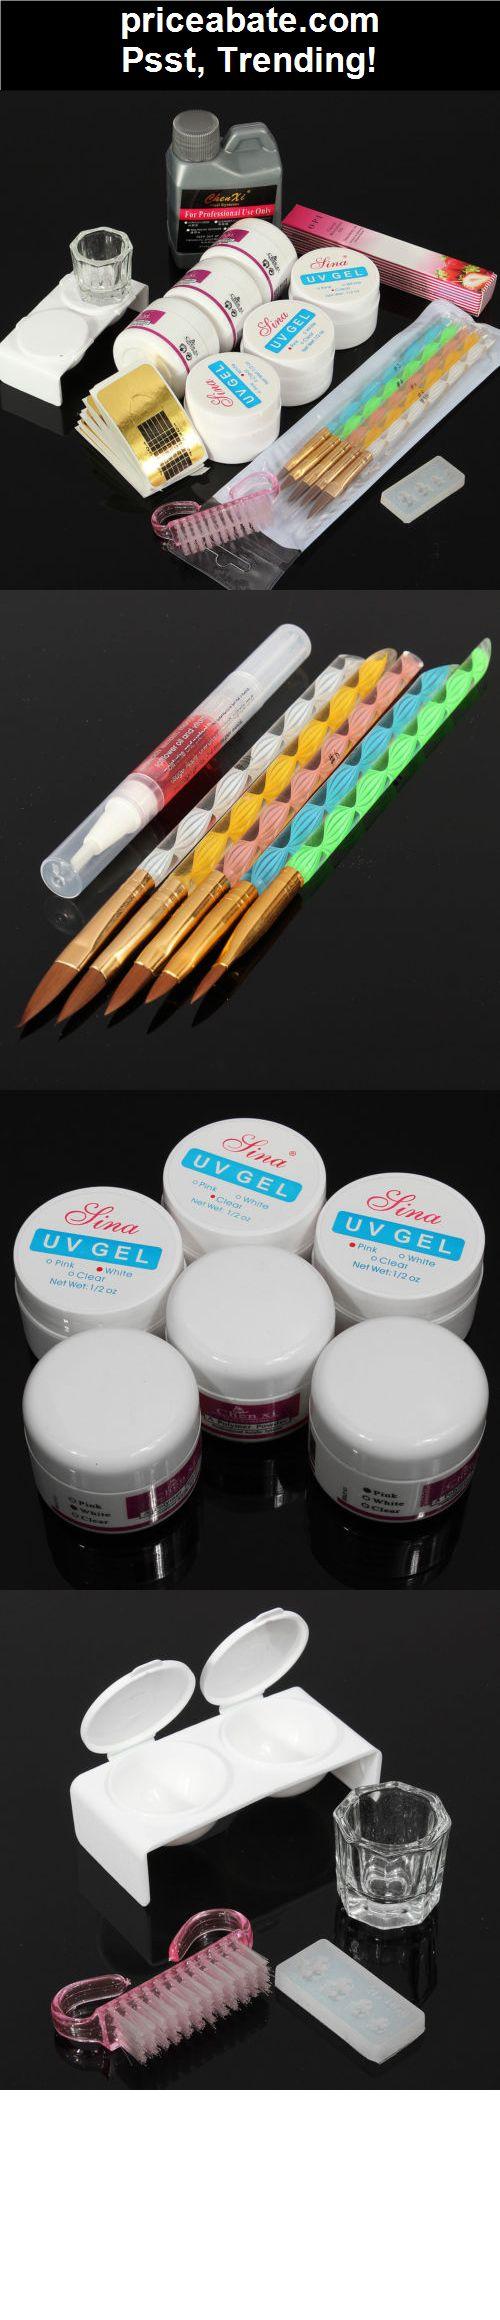 Pro Nail Art Kit Acrylic Starter  Powder Liquid UV GEL Brush Tips Manicure Tool - #priceabate! BUY IT NOW ONLY $12.82